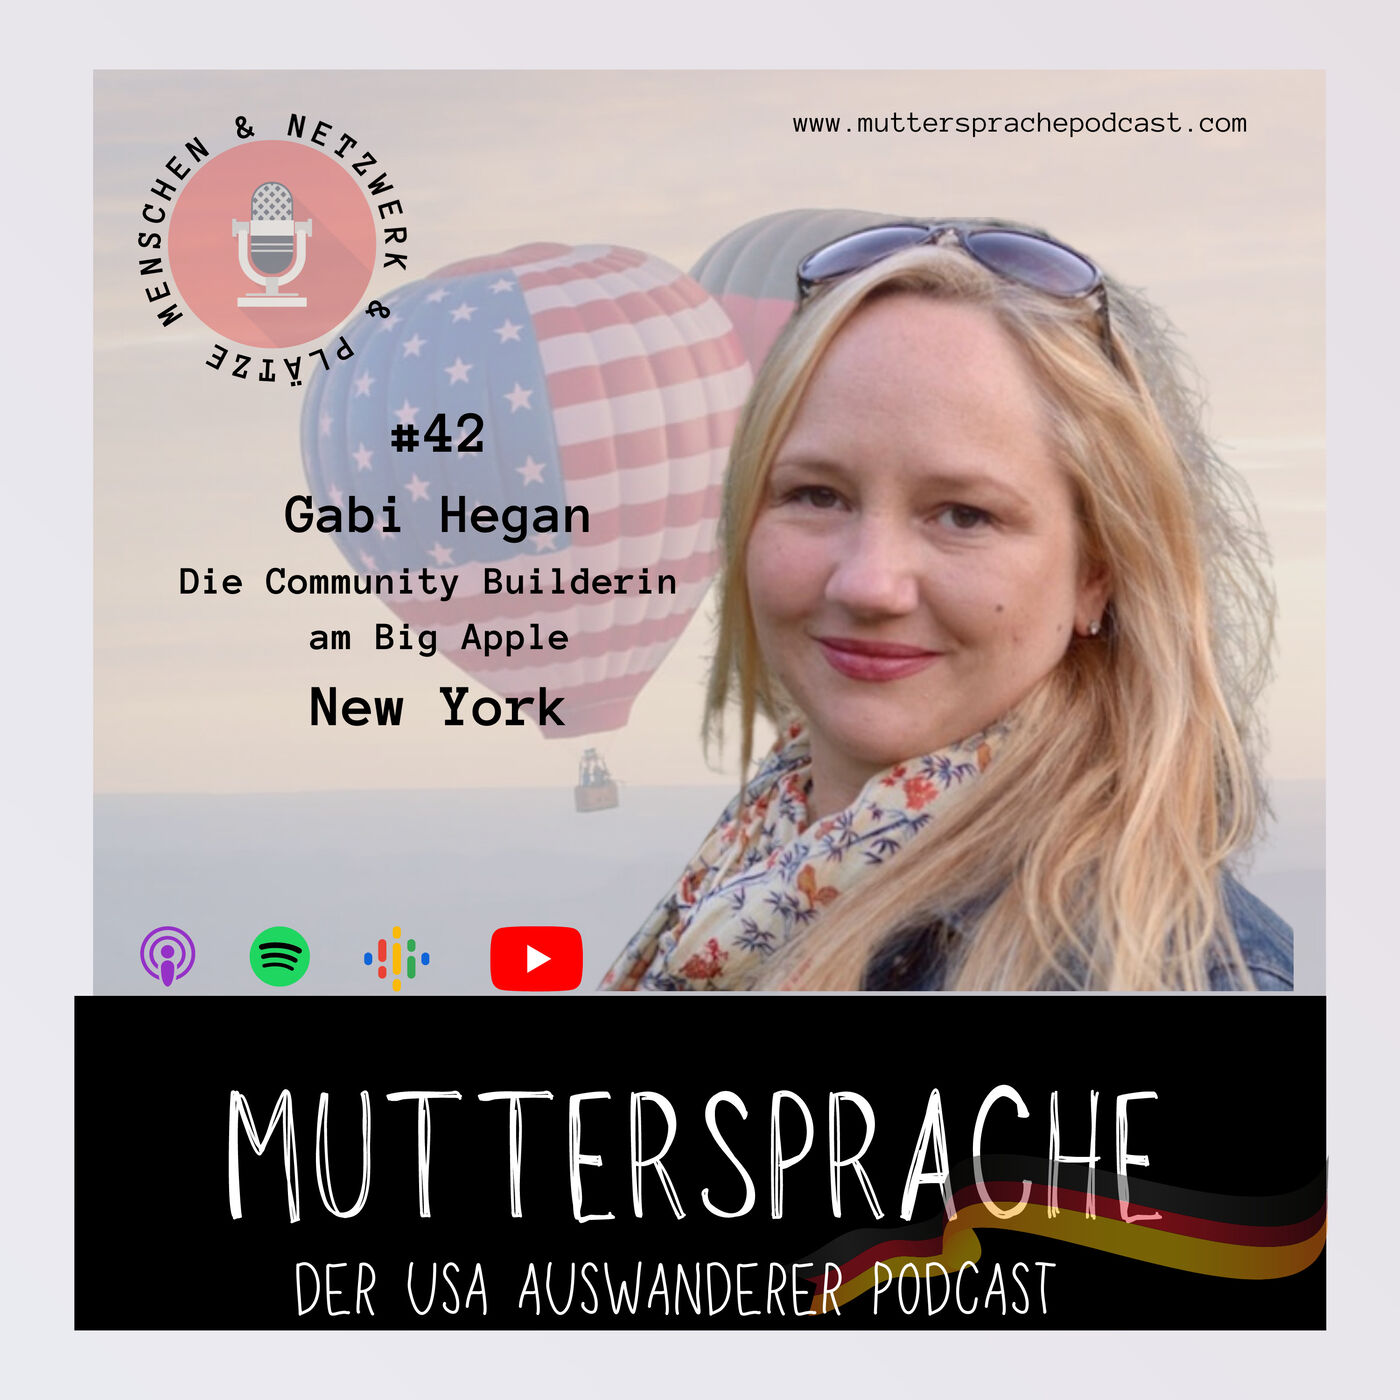 Folge 42: Die Community Builderin GABI HEGAN am Big Apple - NEW YORK